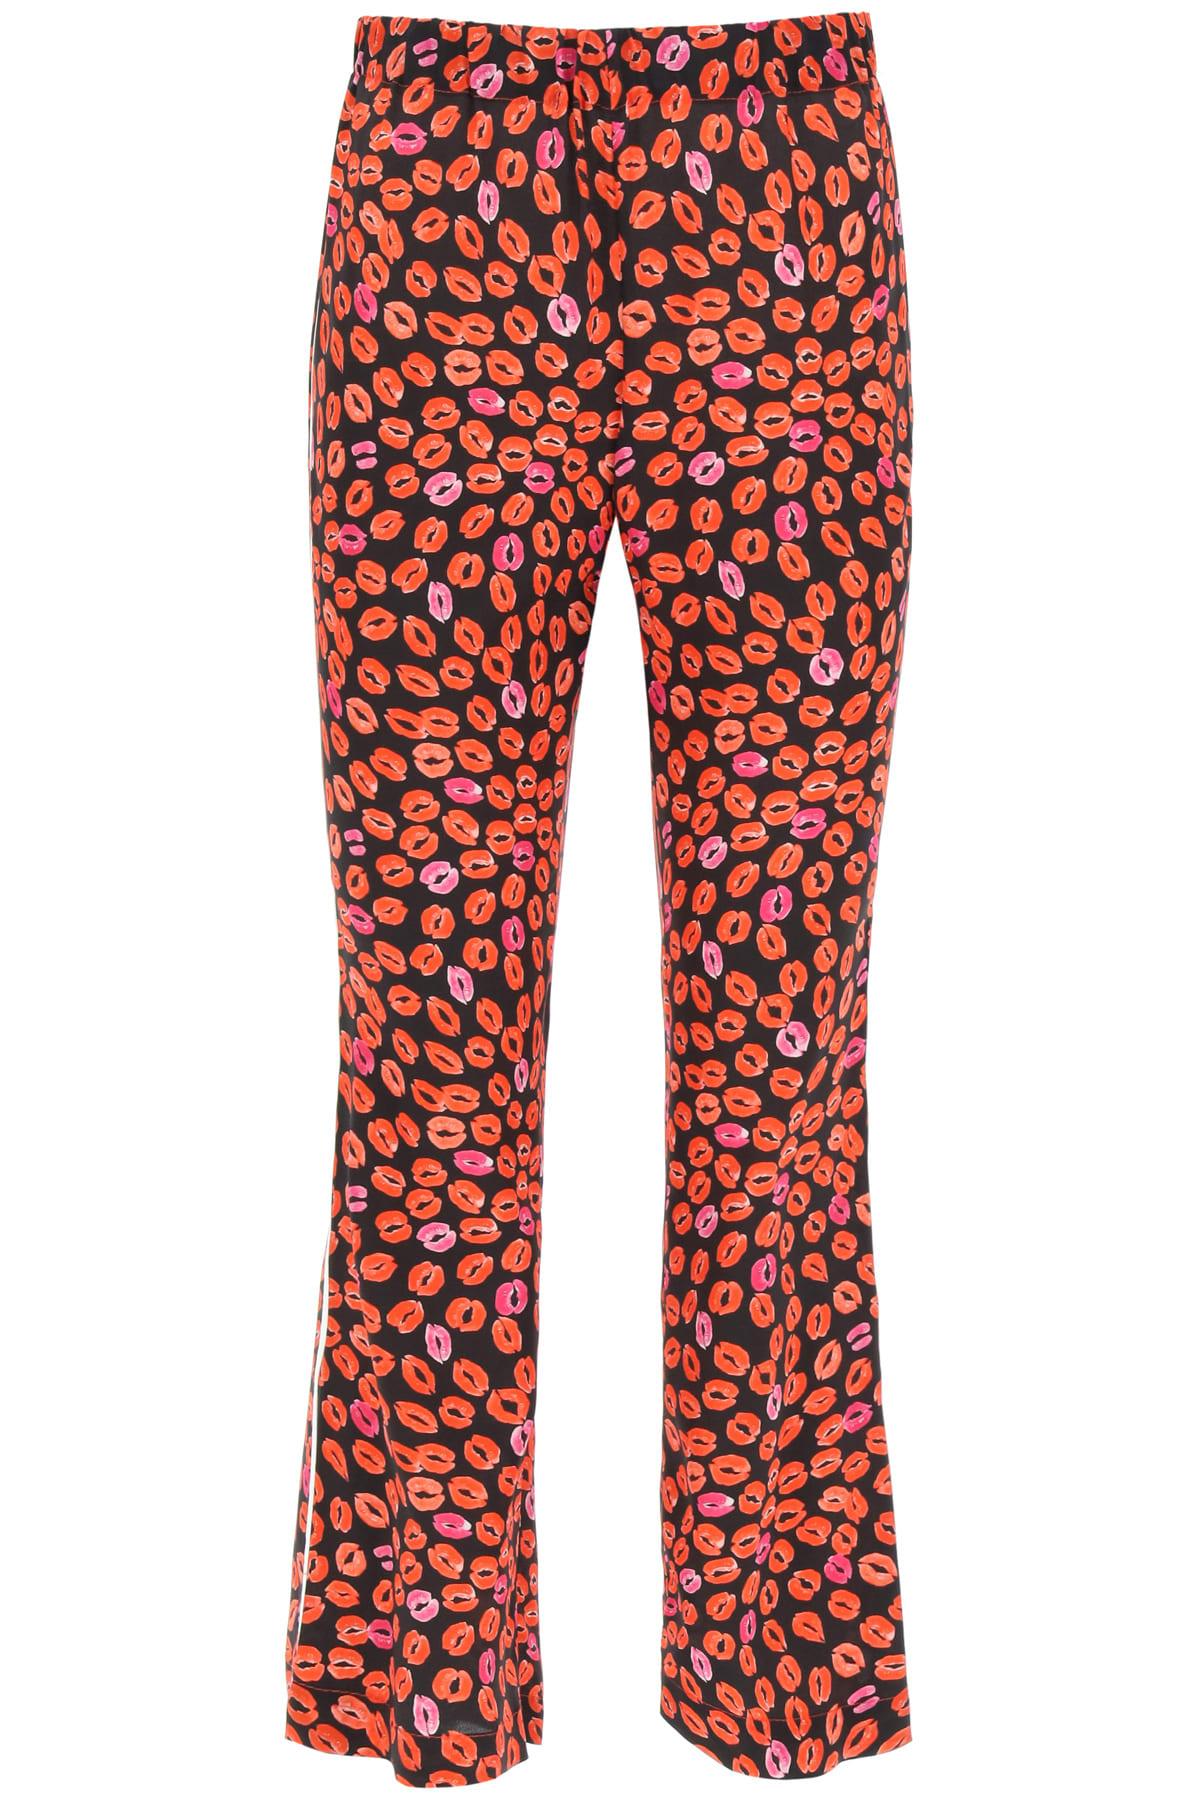 Marni Kiss Print Pajama Trousers